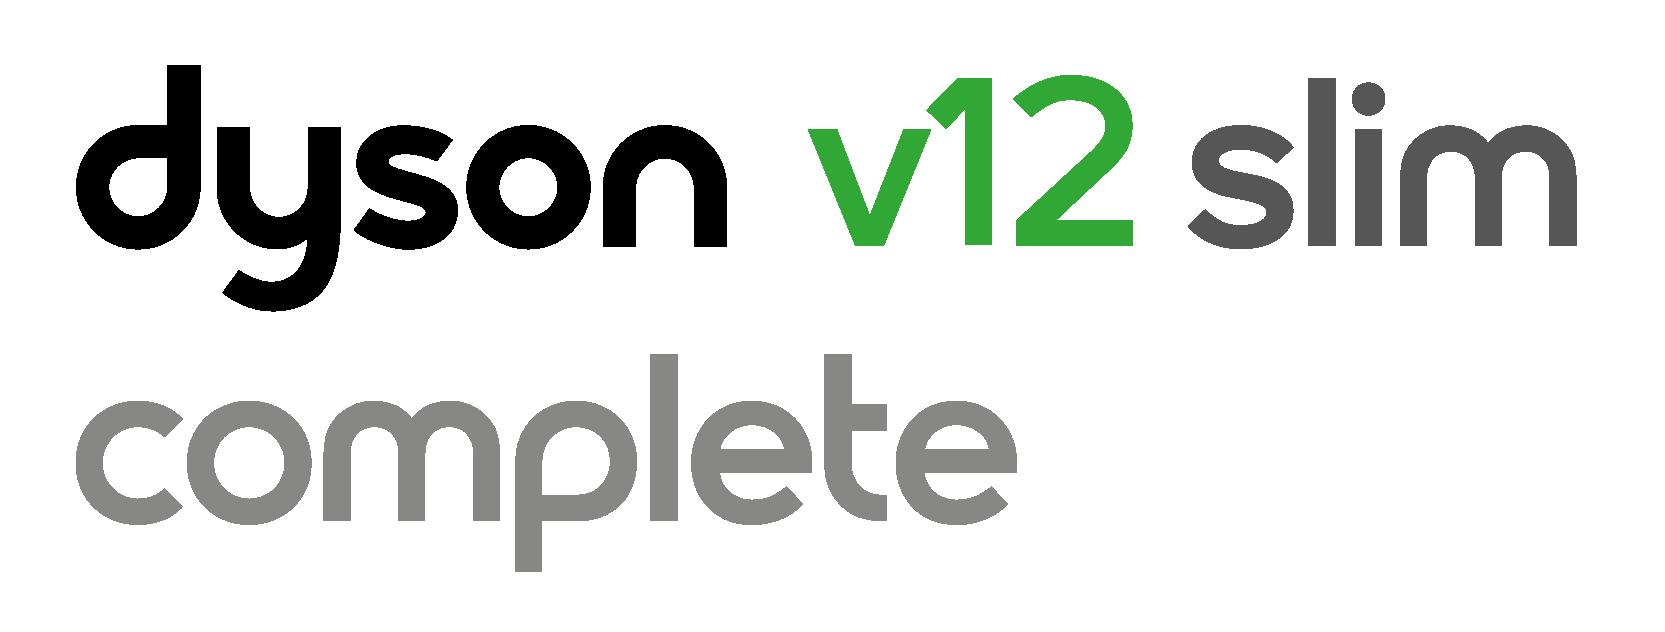 Dyson V12 slim Complete logo